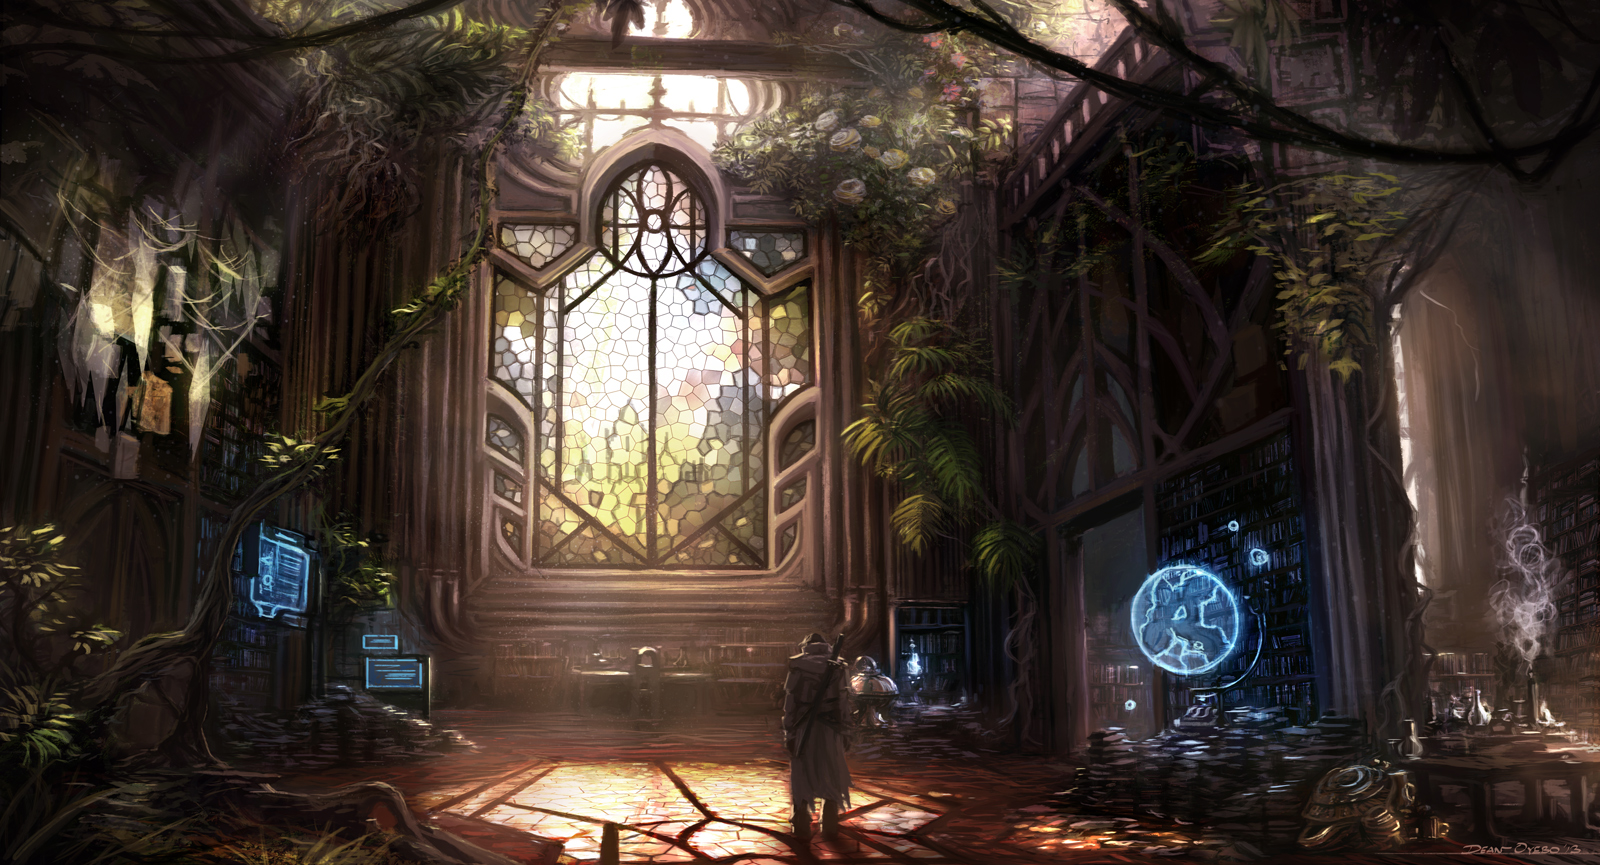 Red's Sanctuary